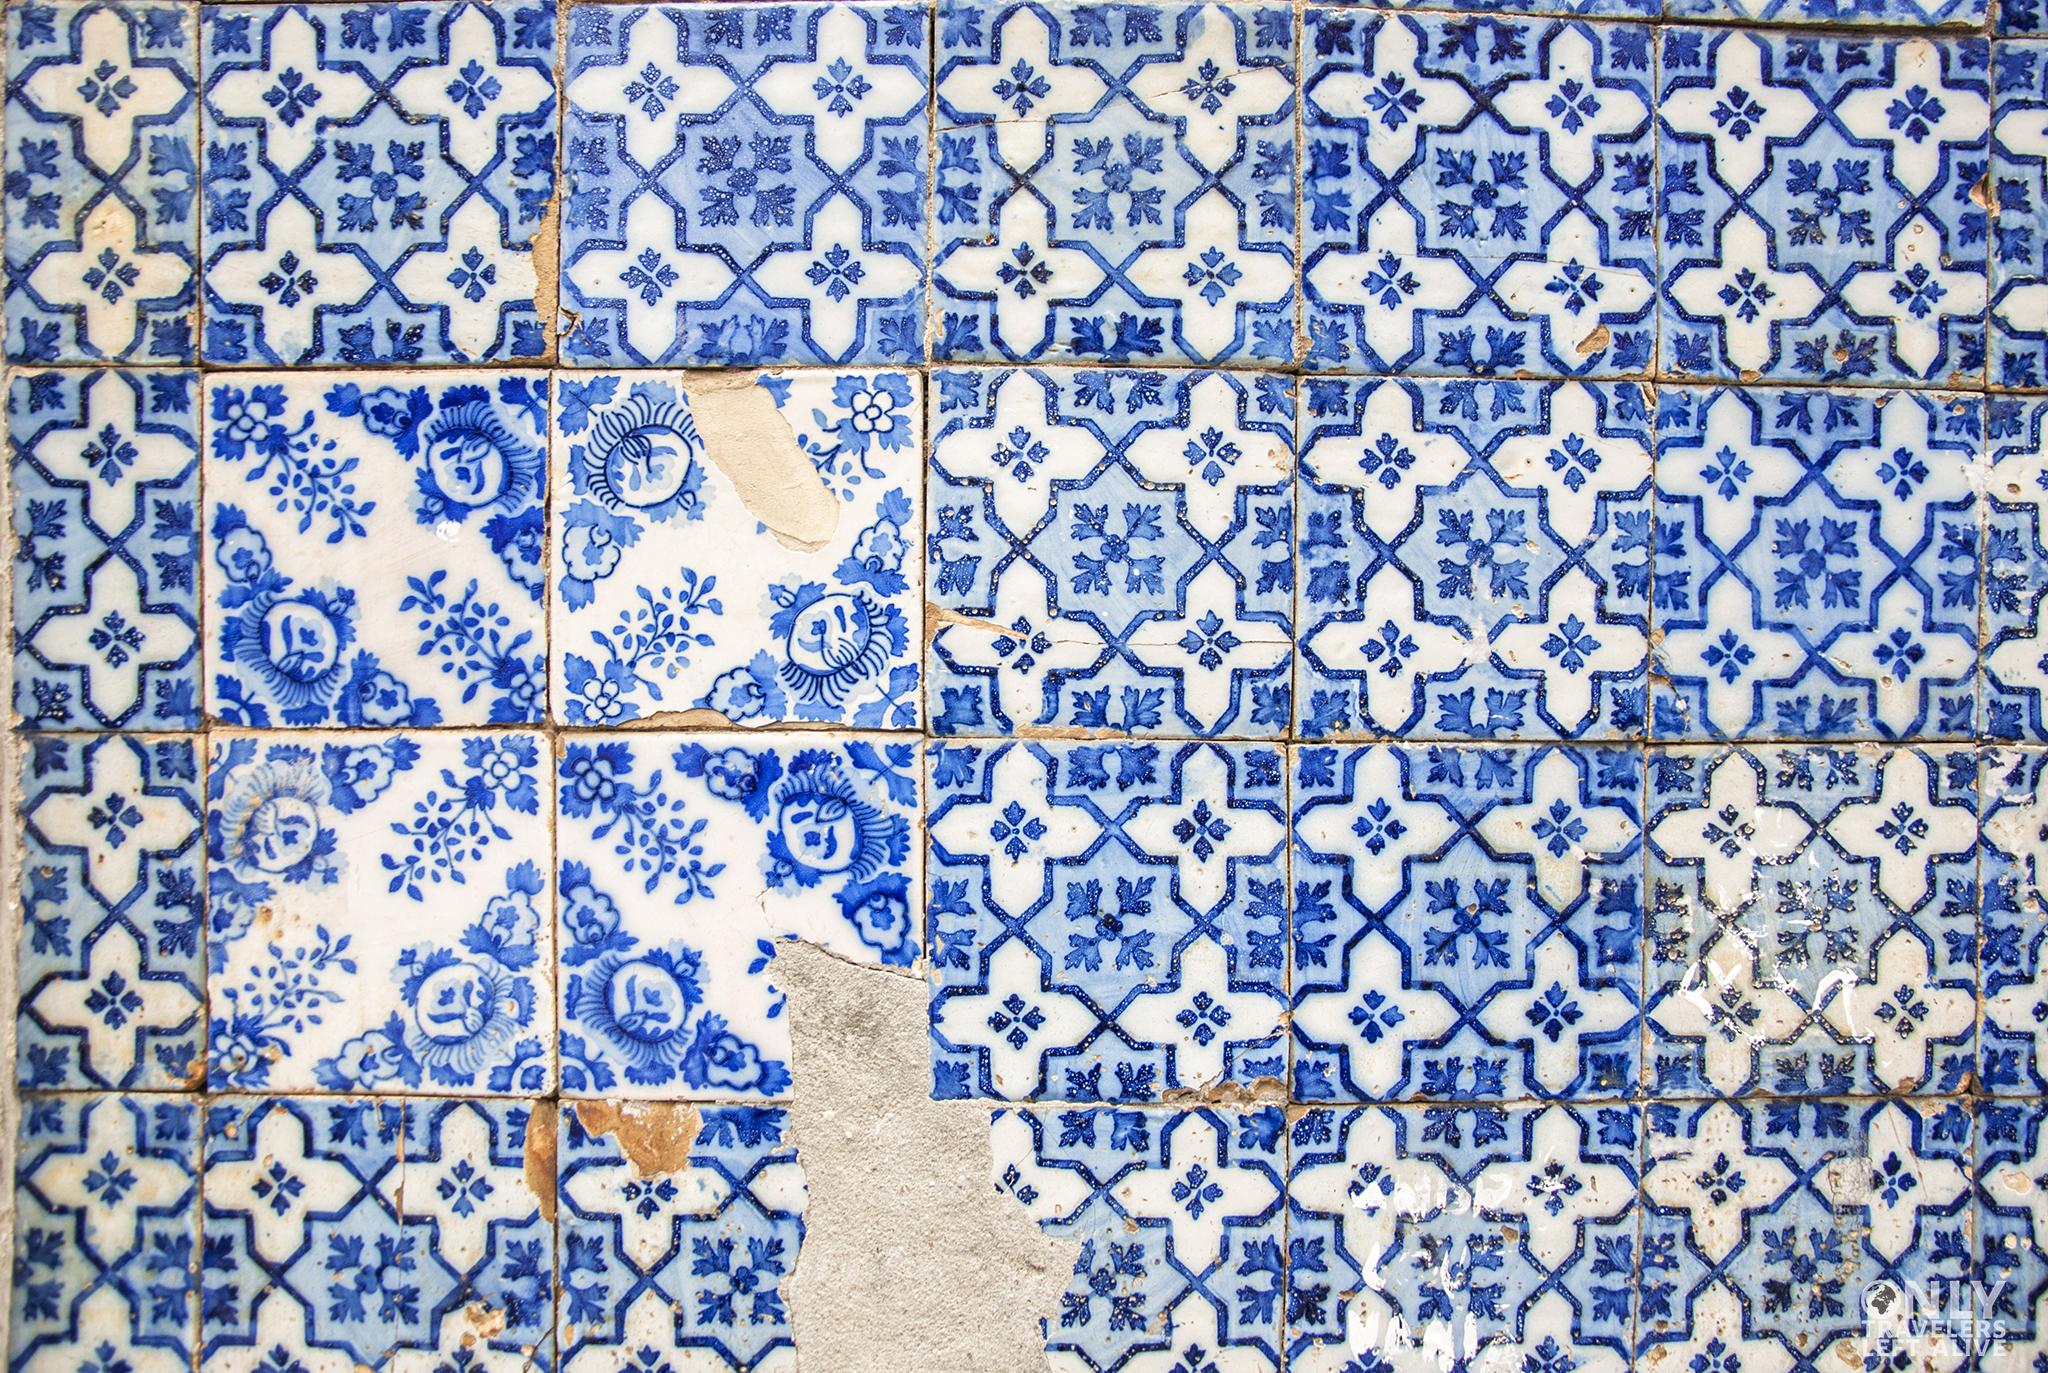 azulejos only travelers left alive